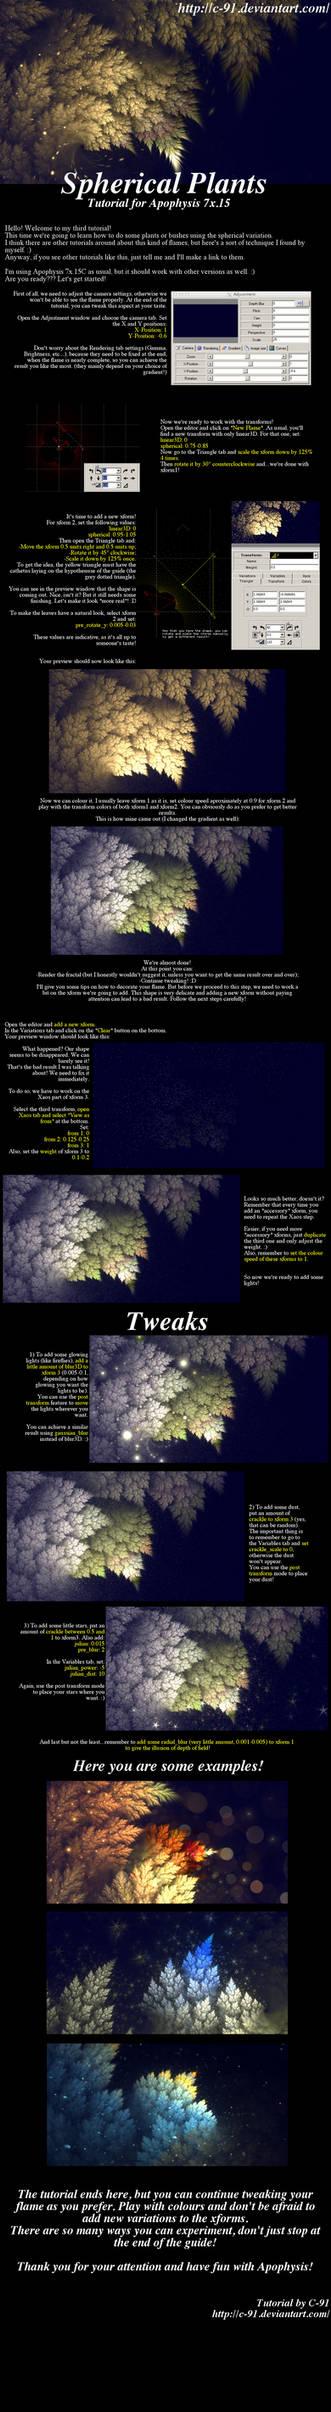 Spherical Plants Apophysis Tutorial